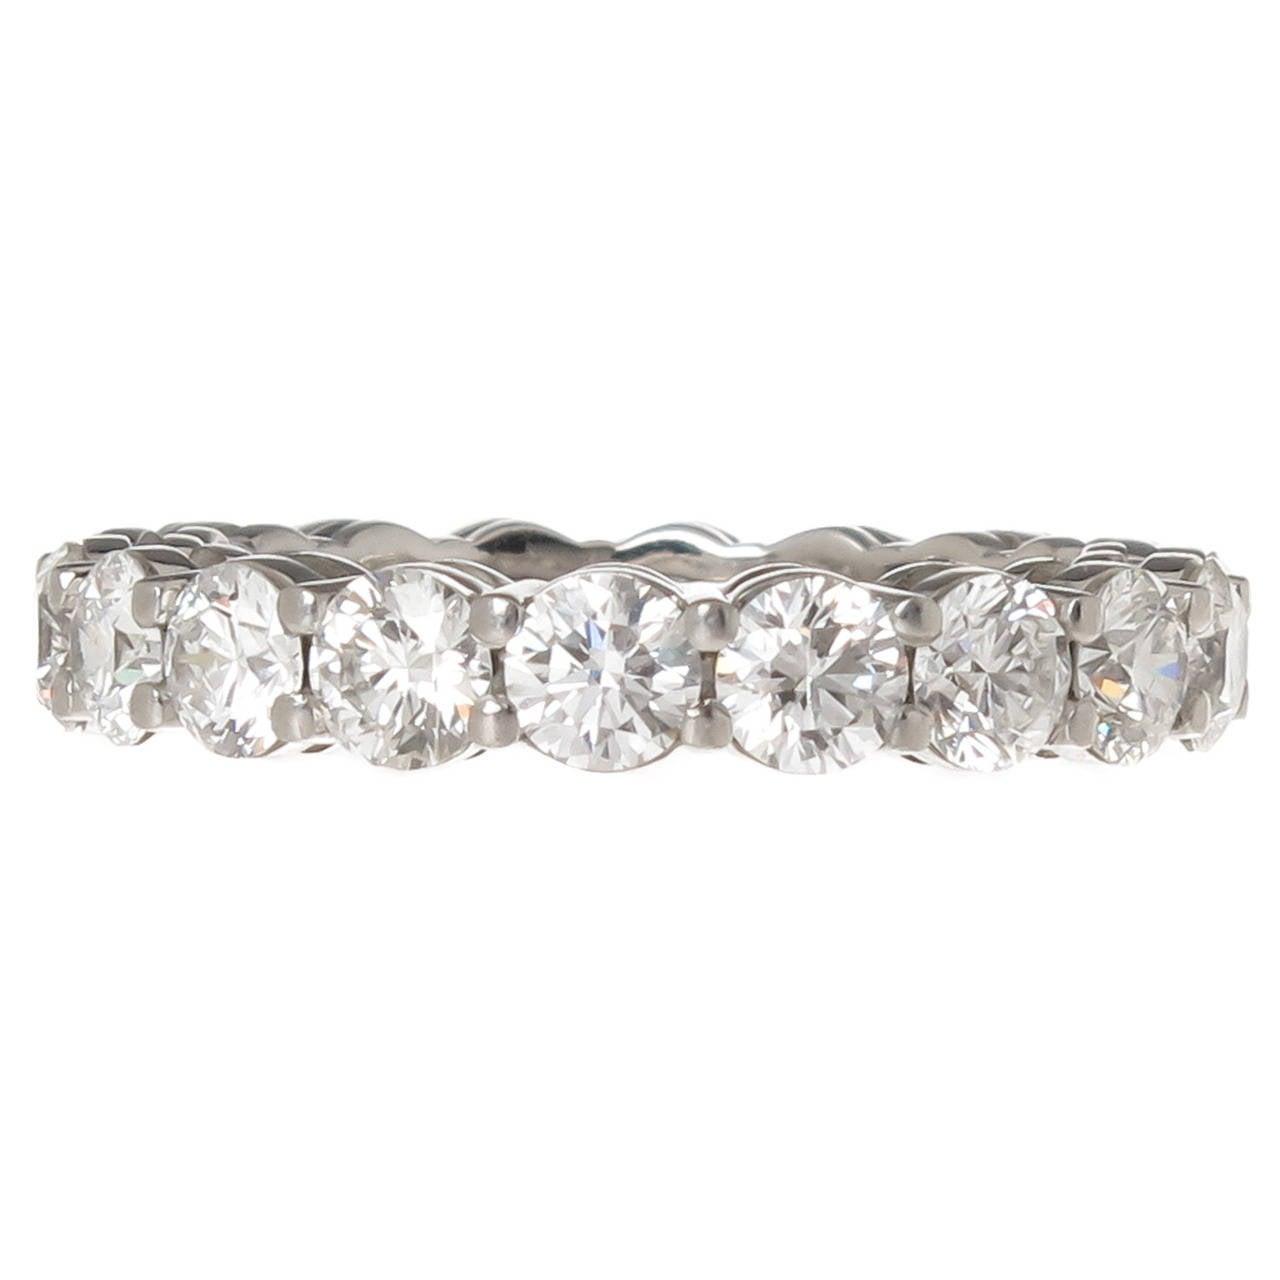 Tiffany And Company Diamond Platinum Eternity Ring At 1stdibs